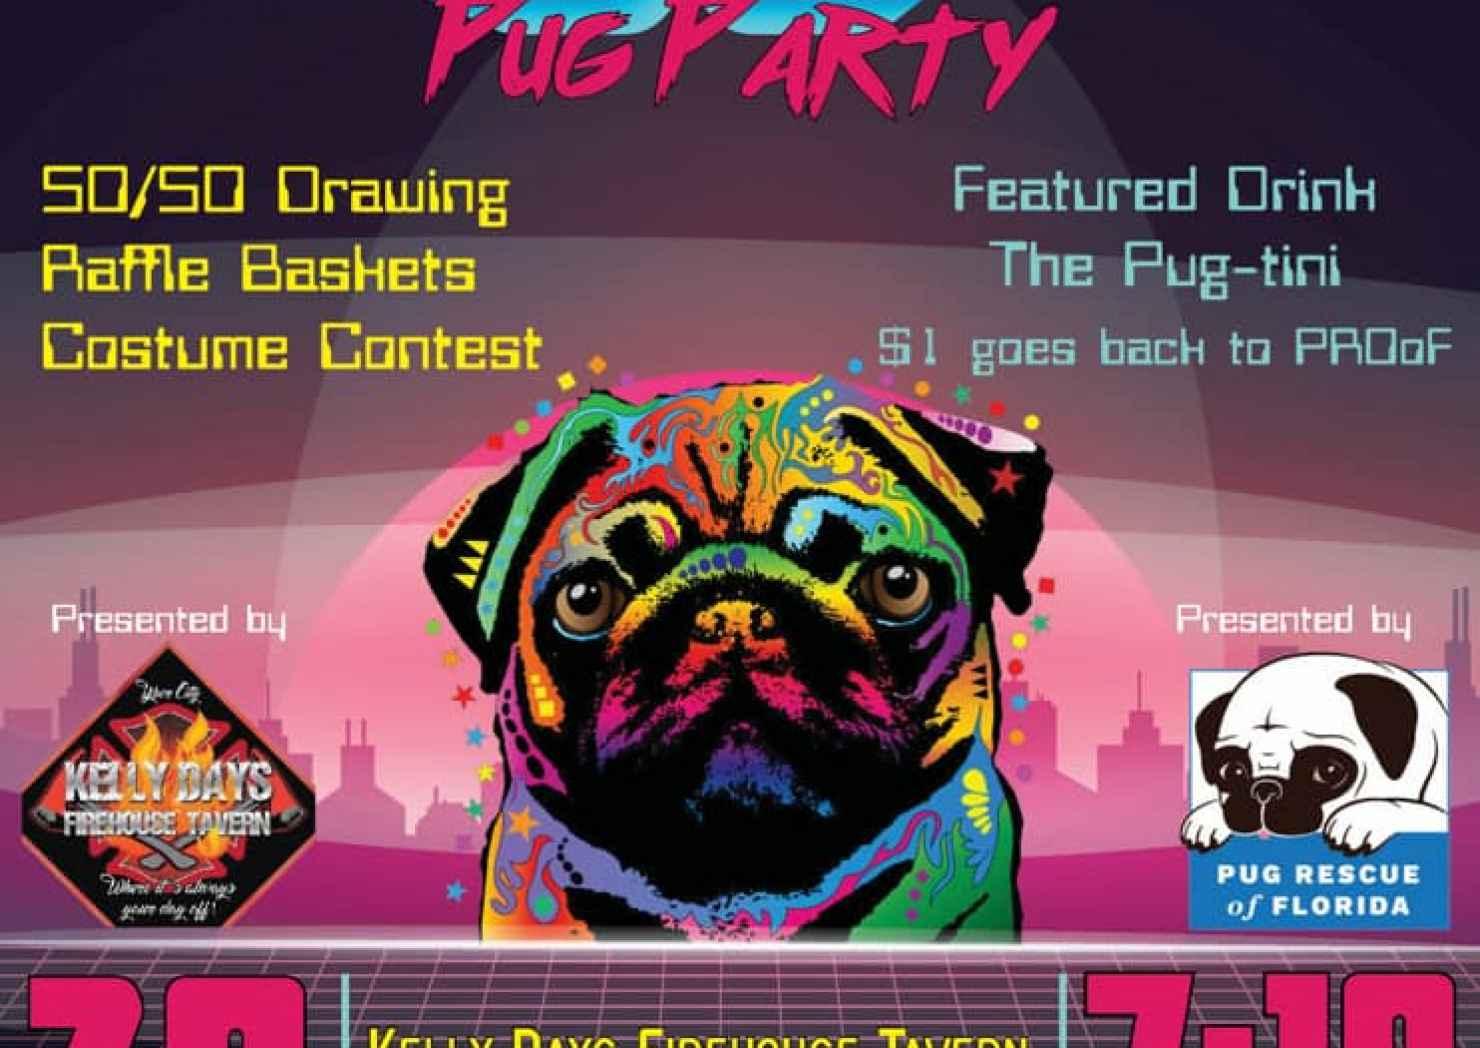 80's Night Fundraiser Pug Rescue of Florida